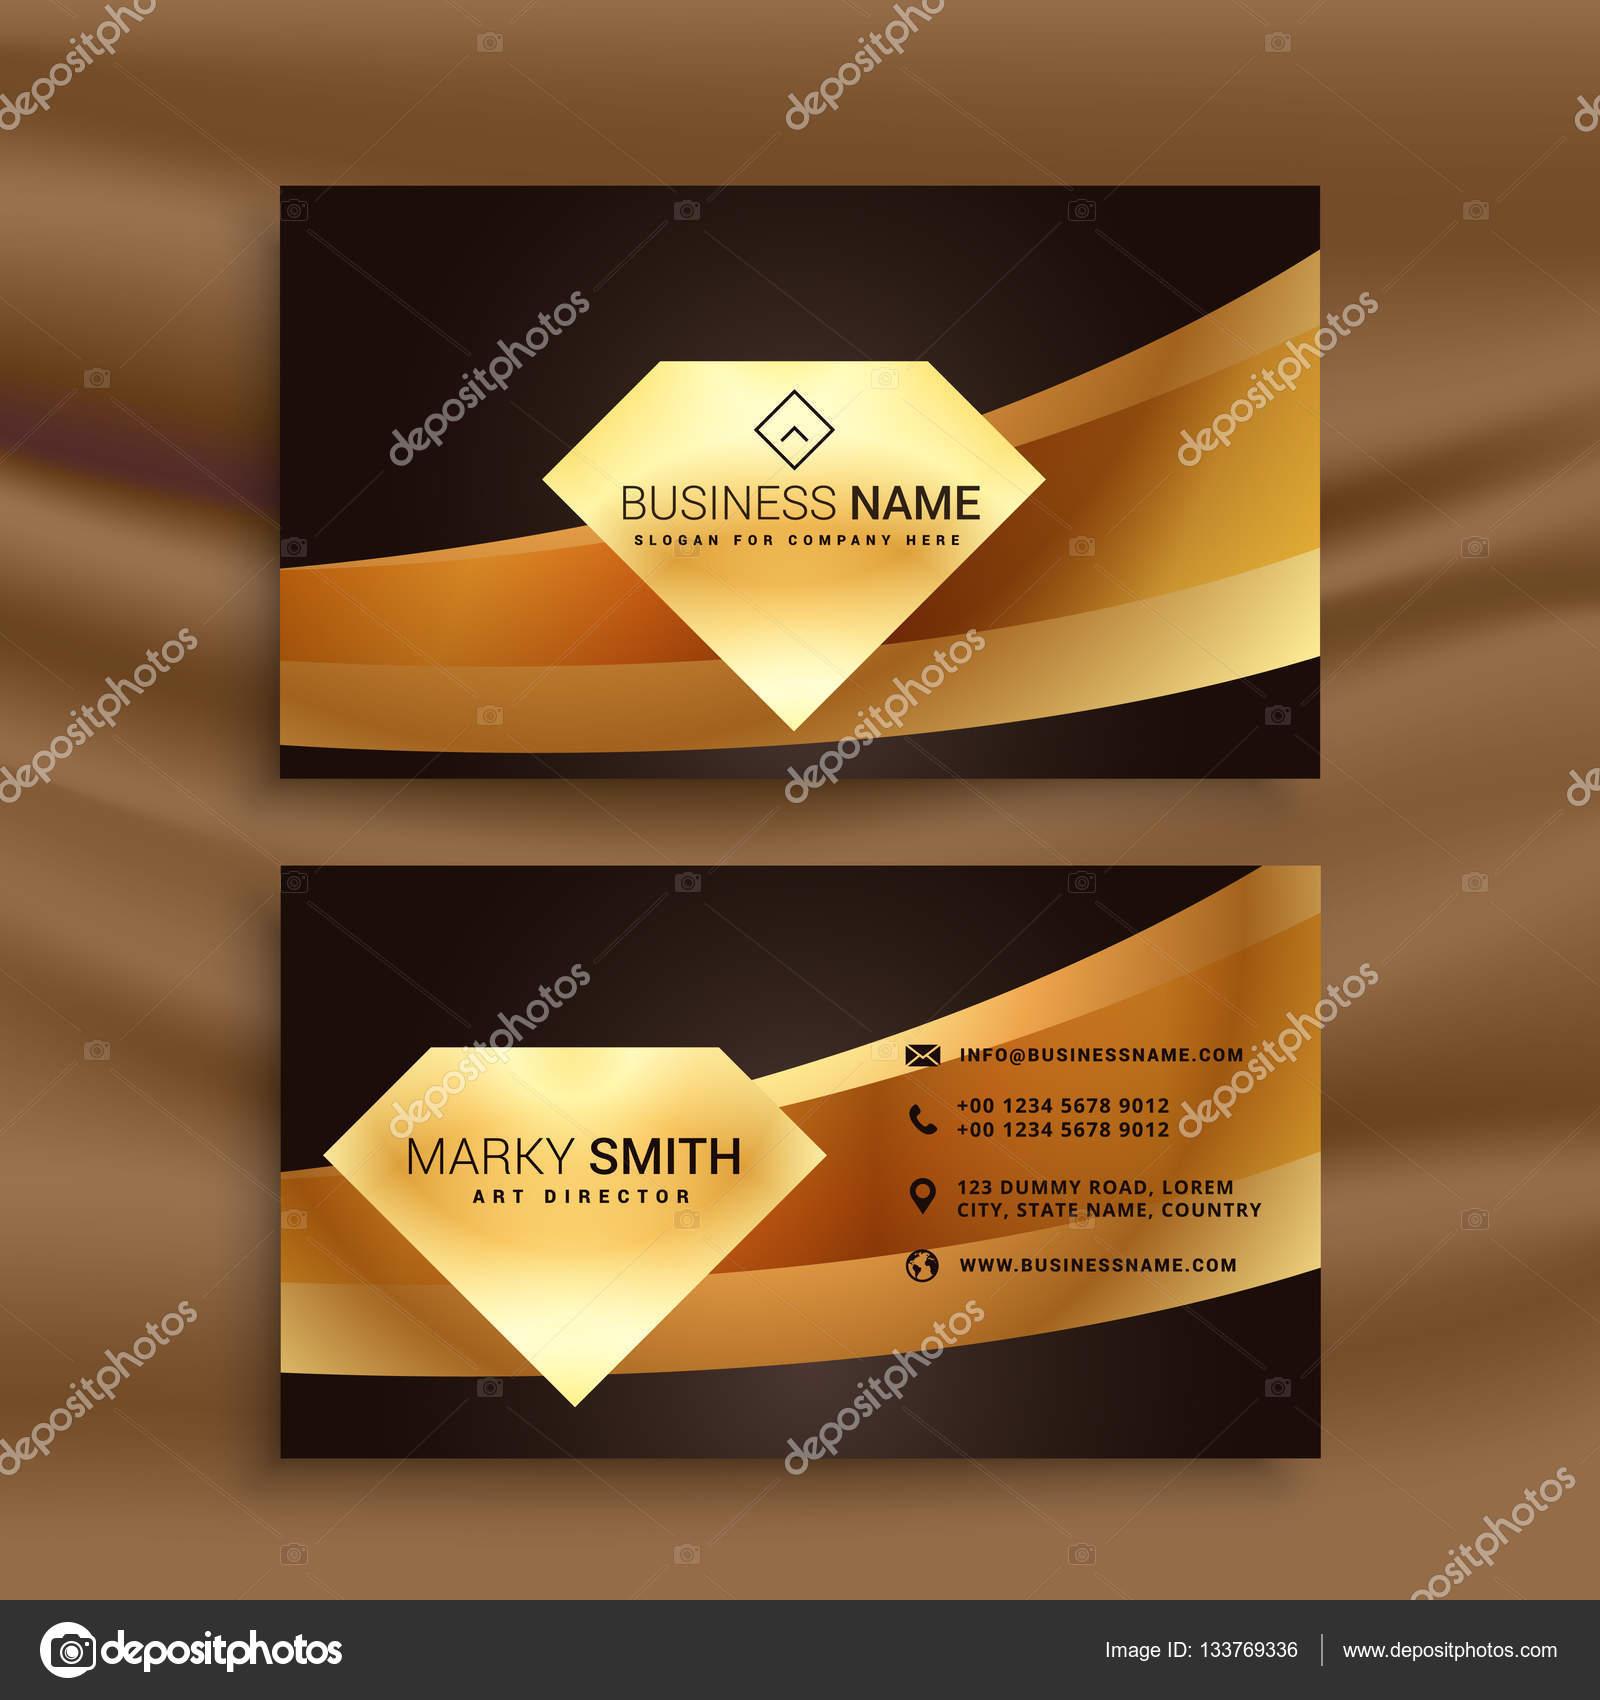 Modele De Carte Visite Premium Avec Forme Donde Dor Illustration Stock